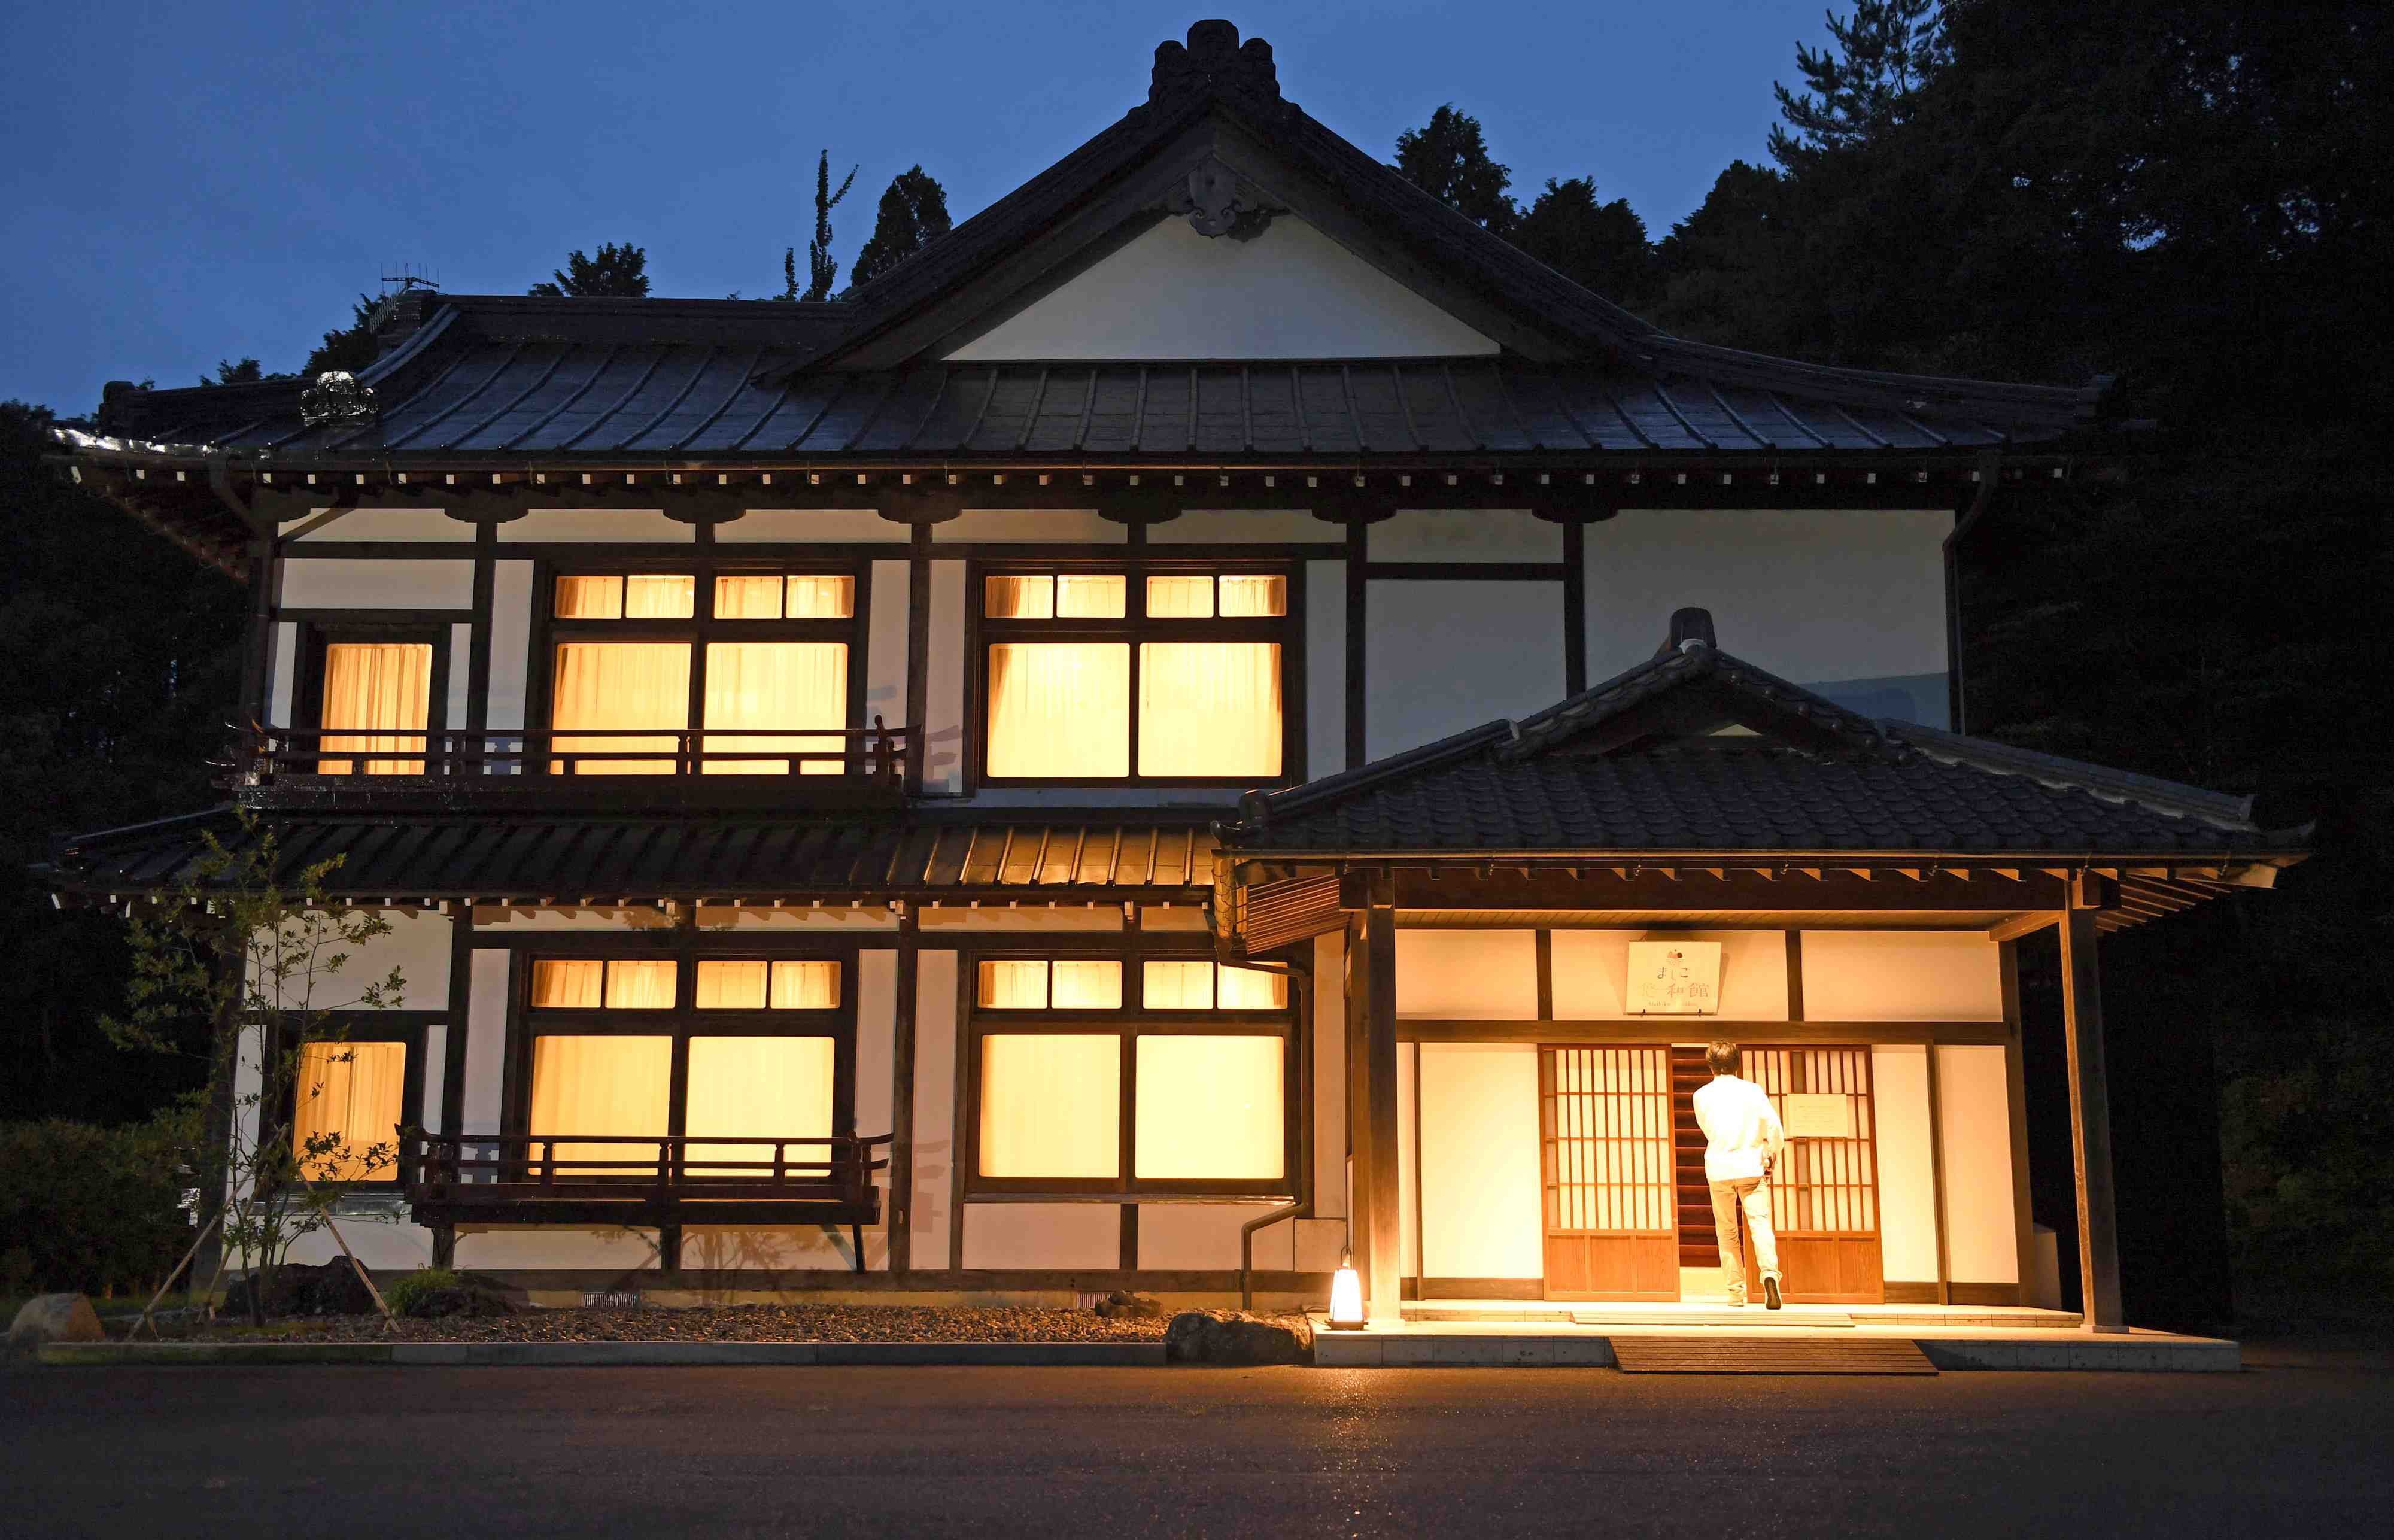 Nanma Hotel Symbolizes The Emperor Emeritus's Hope for Peace